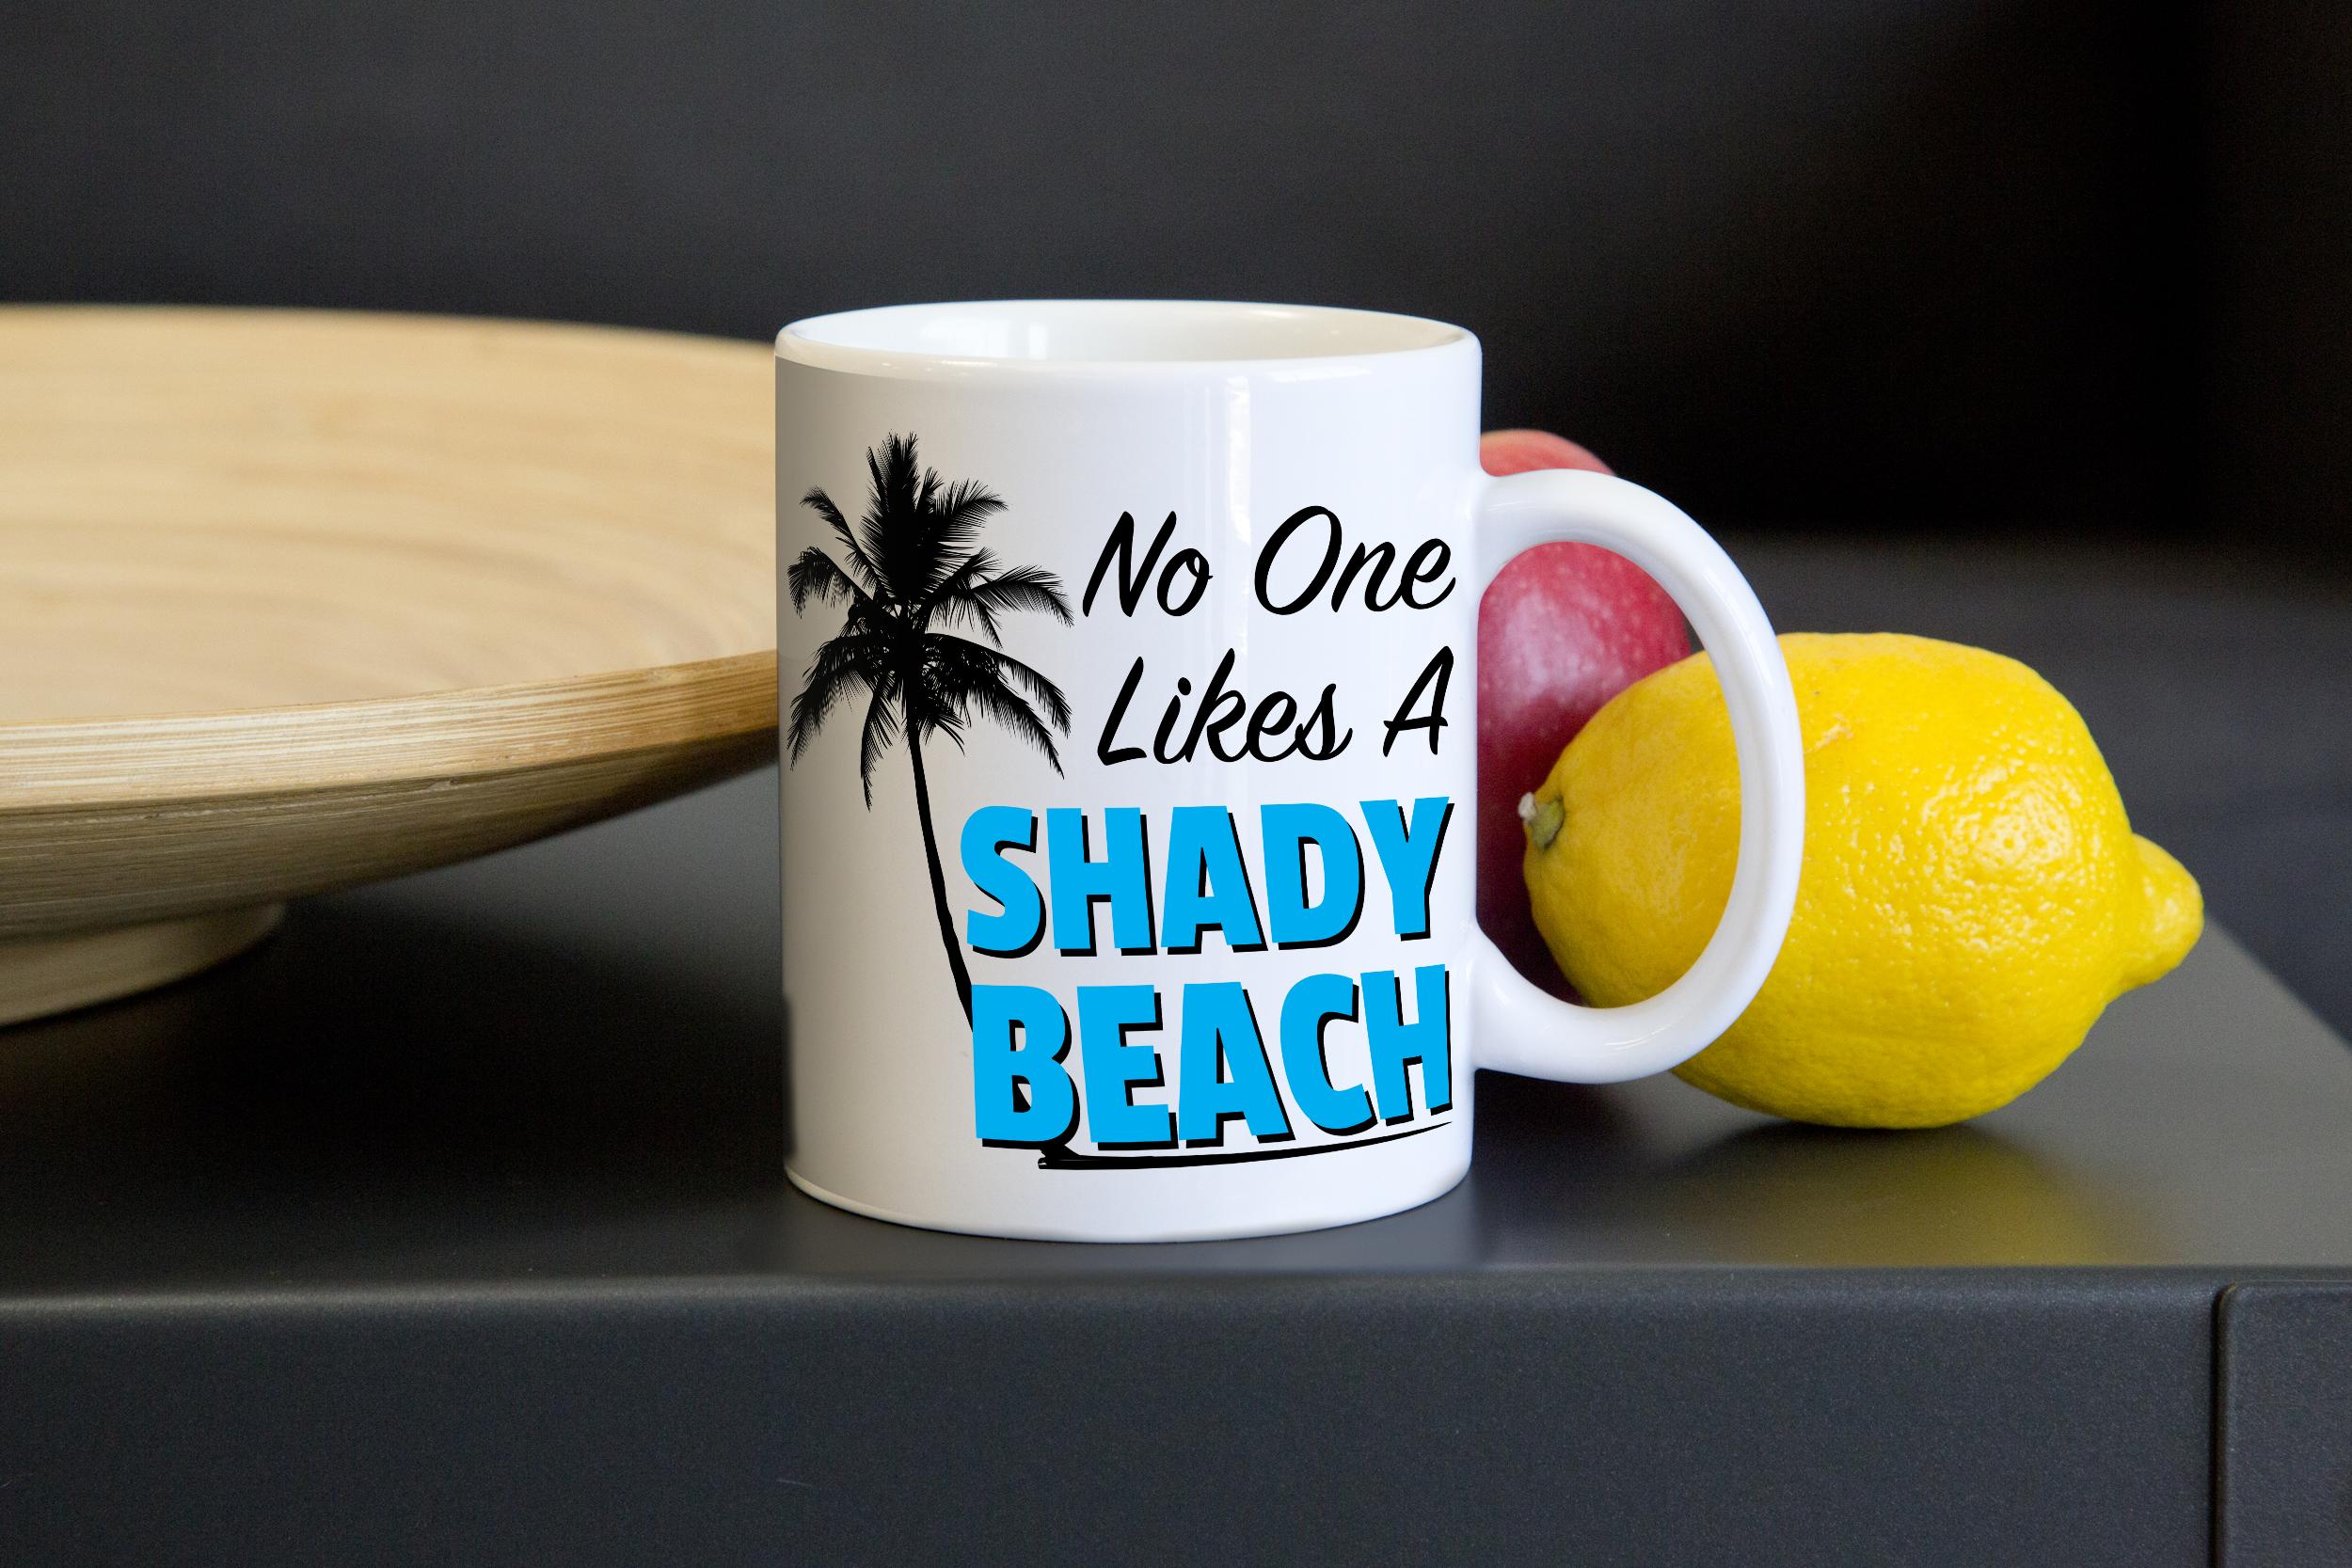 43221a44fc6 No One Likes a Shady Beach Mug